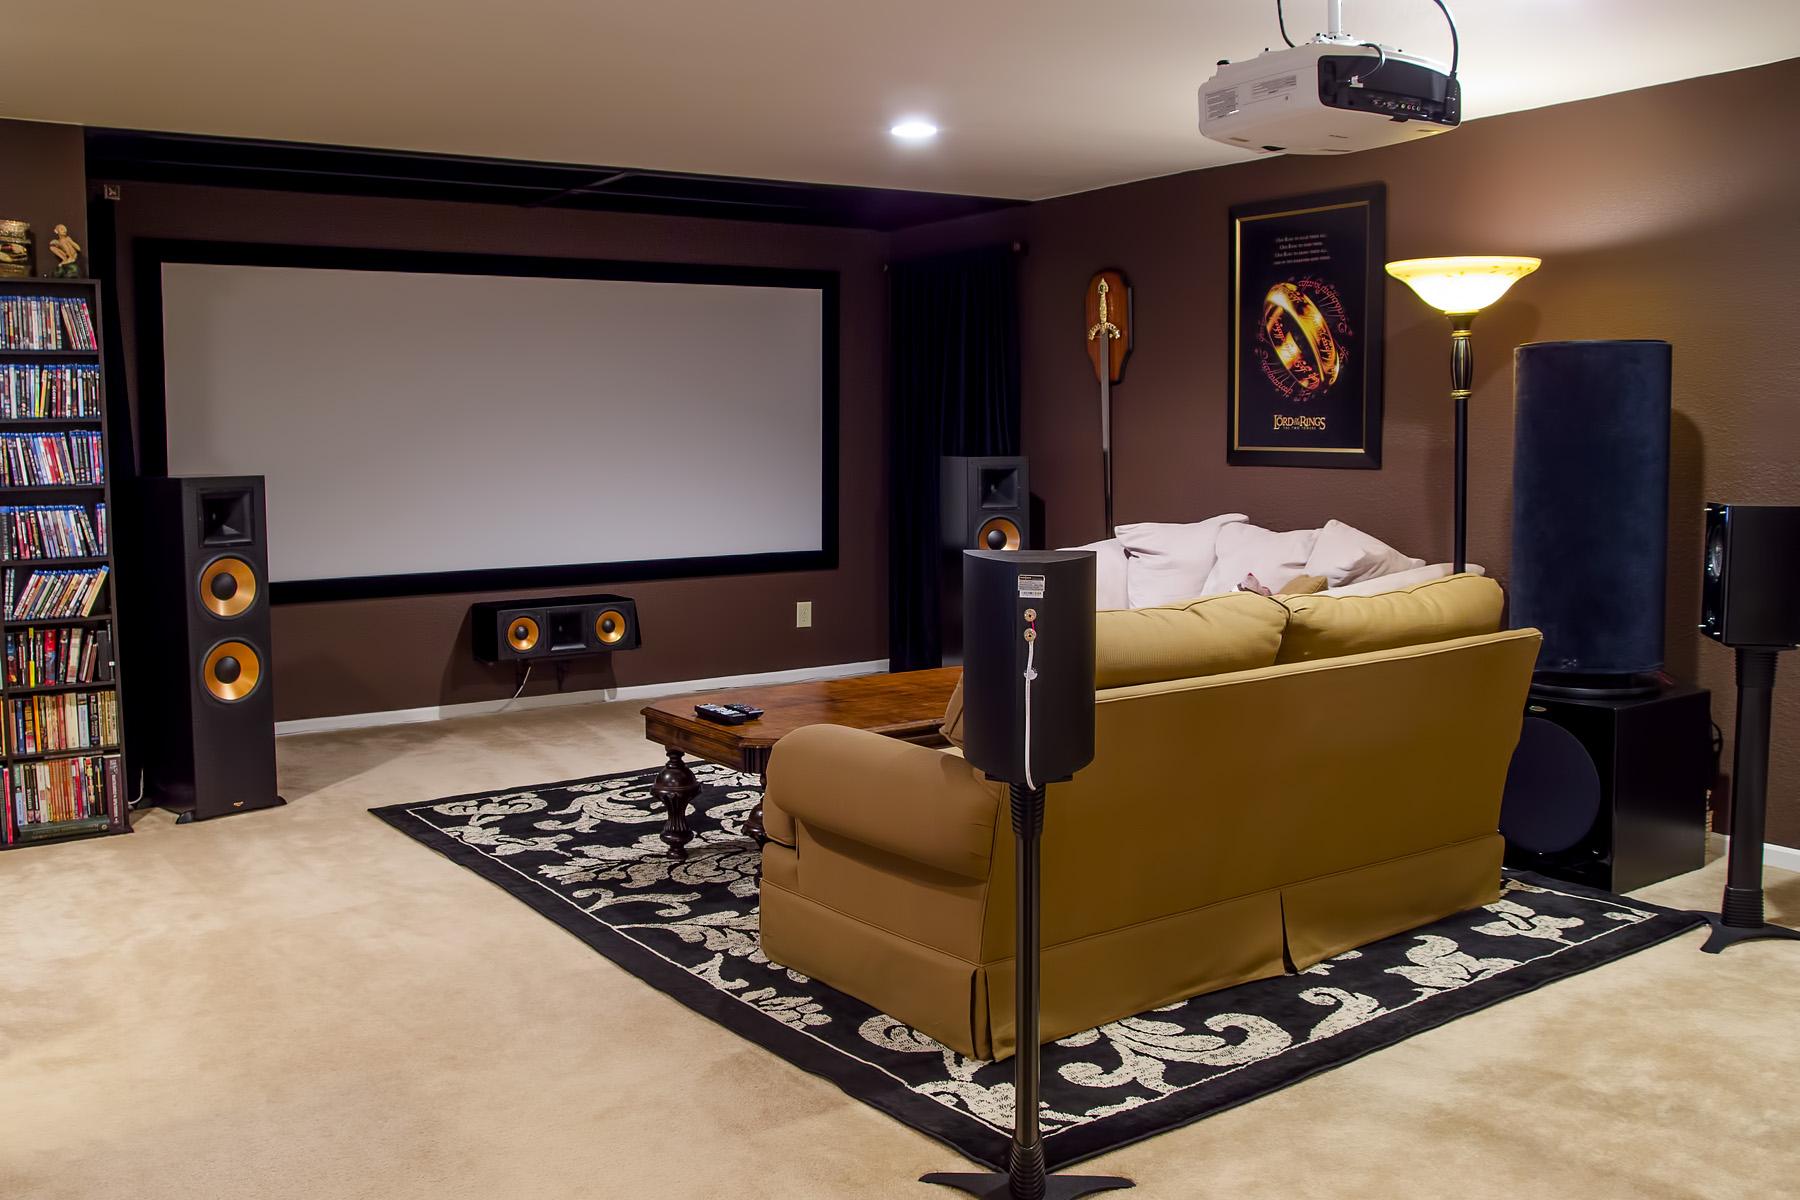 The Epic Home Theater Photo Critique Thread-5b380174_2014_home_theater_2x3.jpg